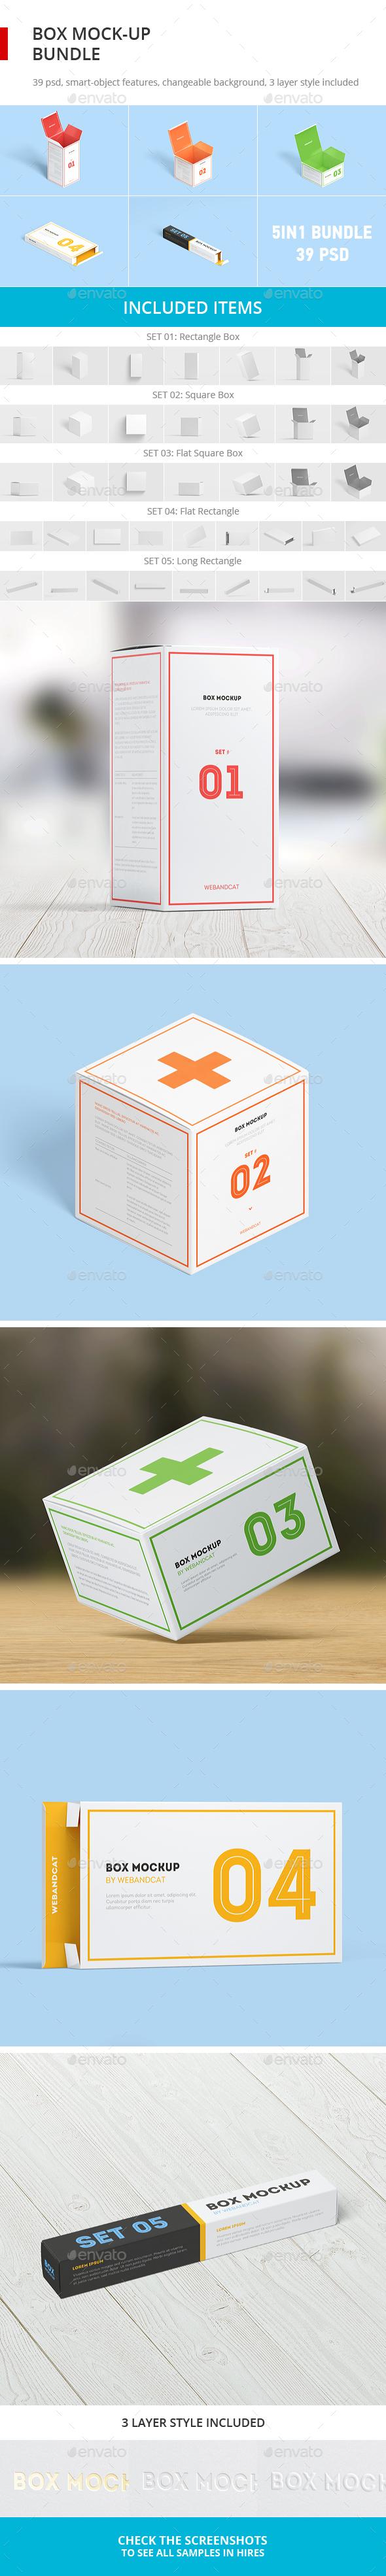 Box Mock-up Bundle